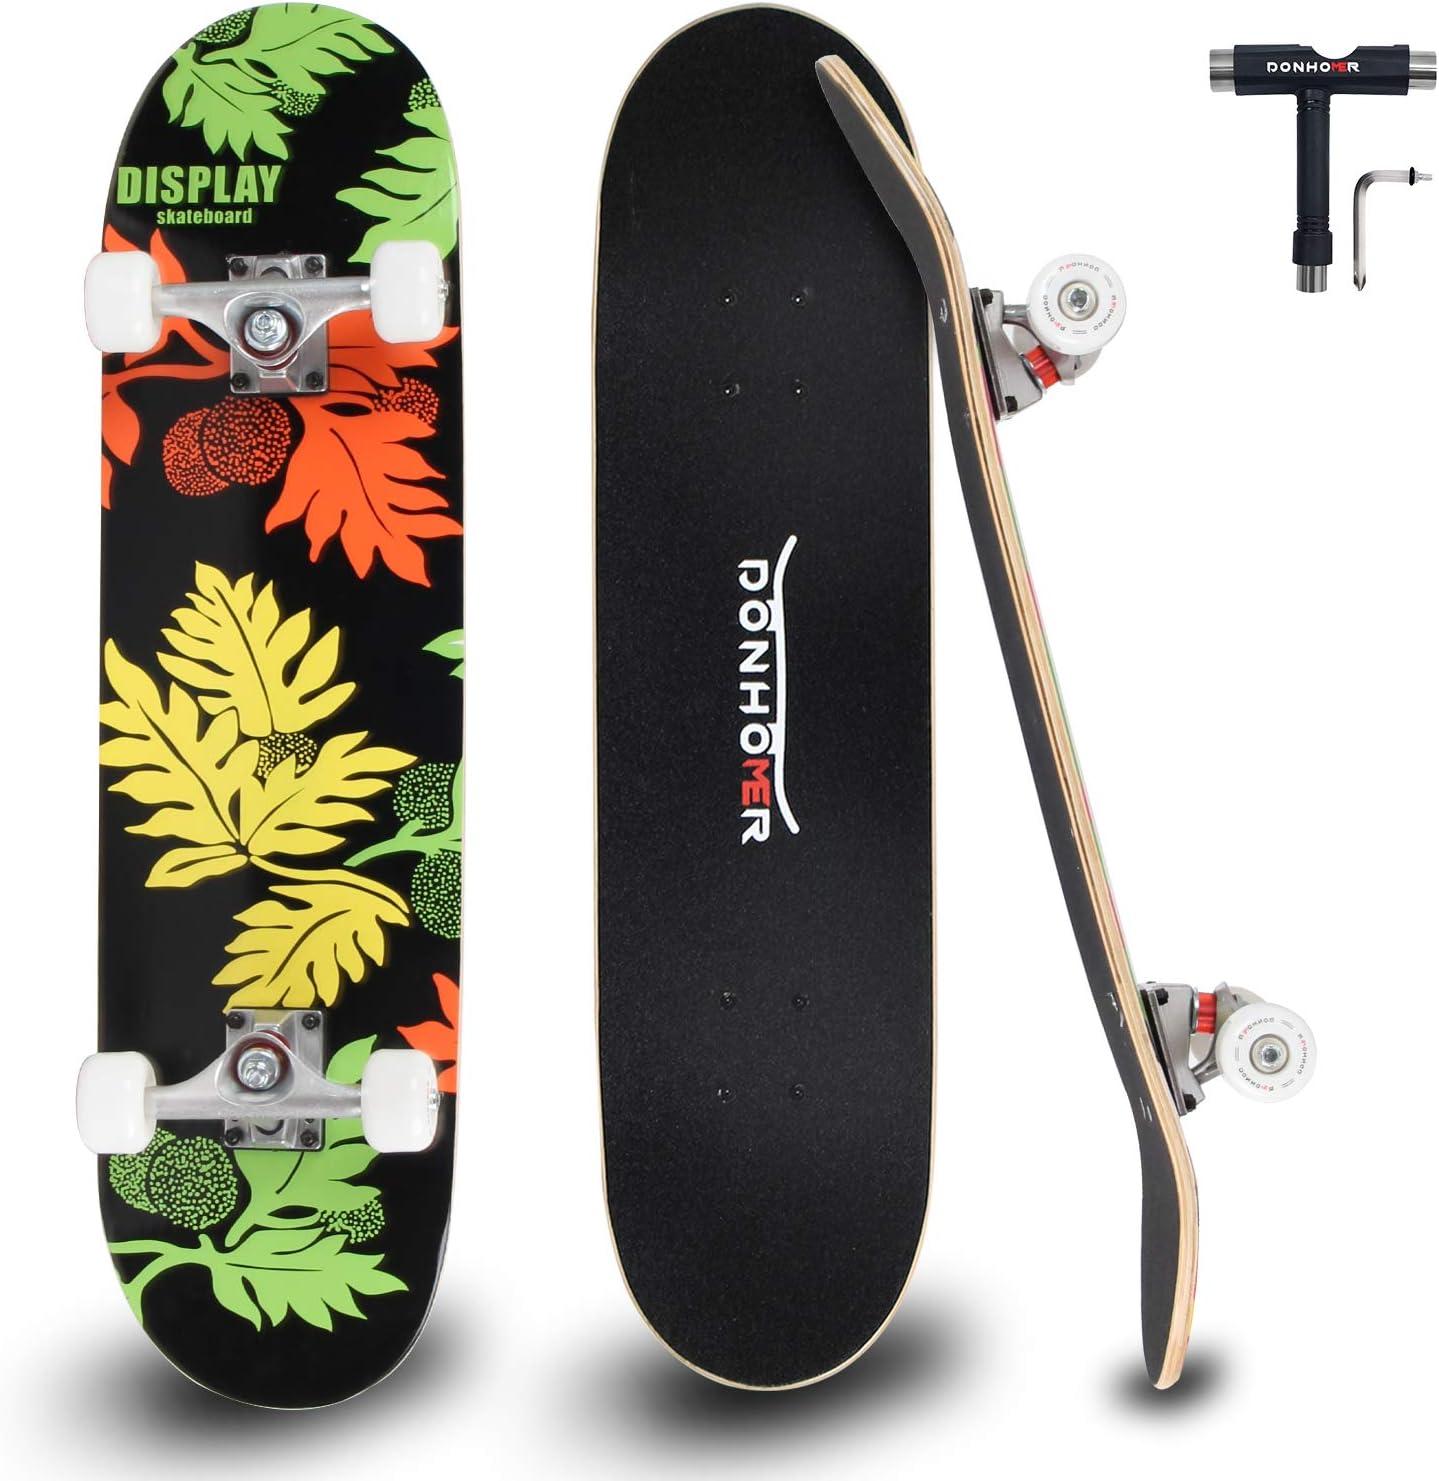 DONHOMER Skateboards Fashionable Pro 31